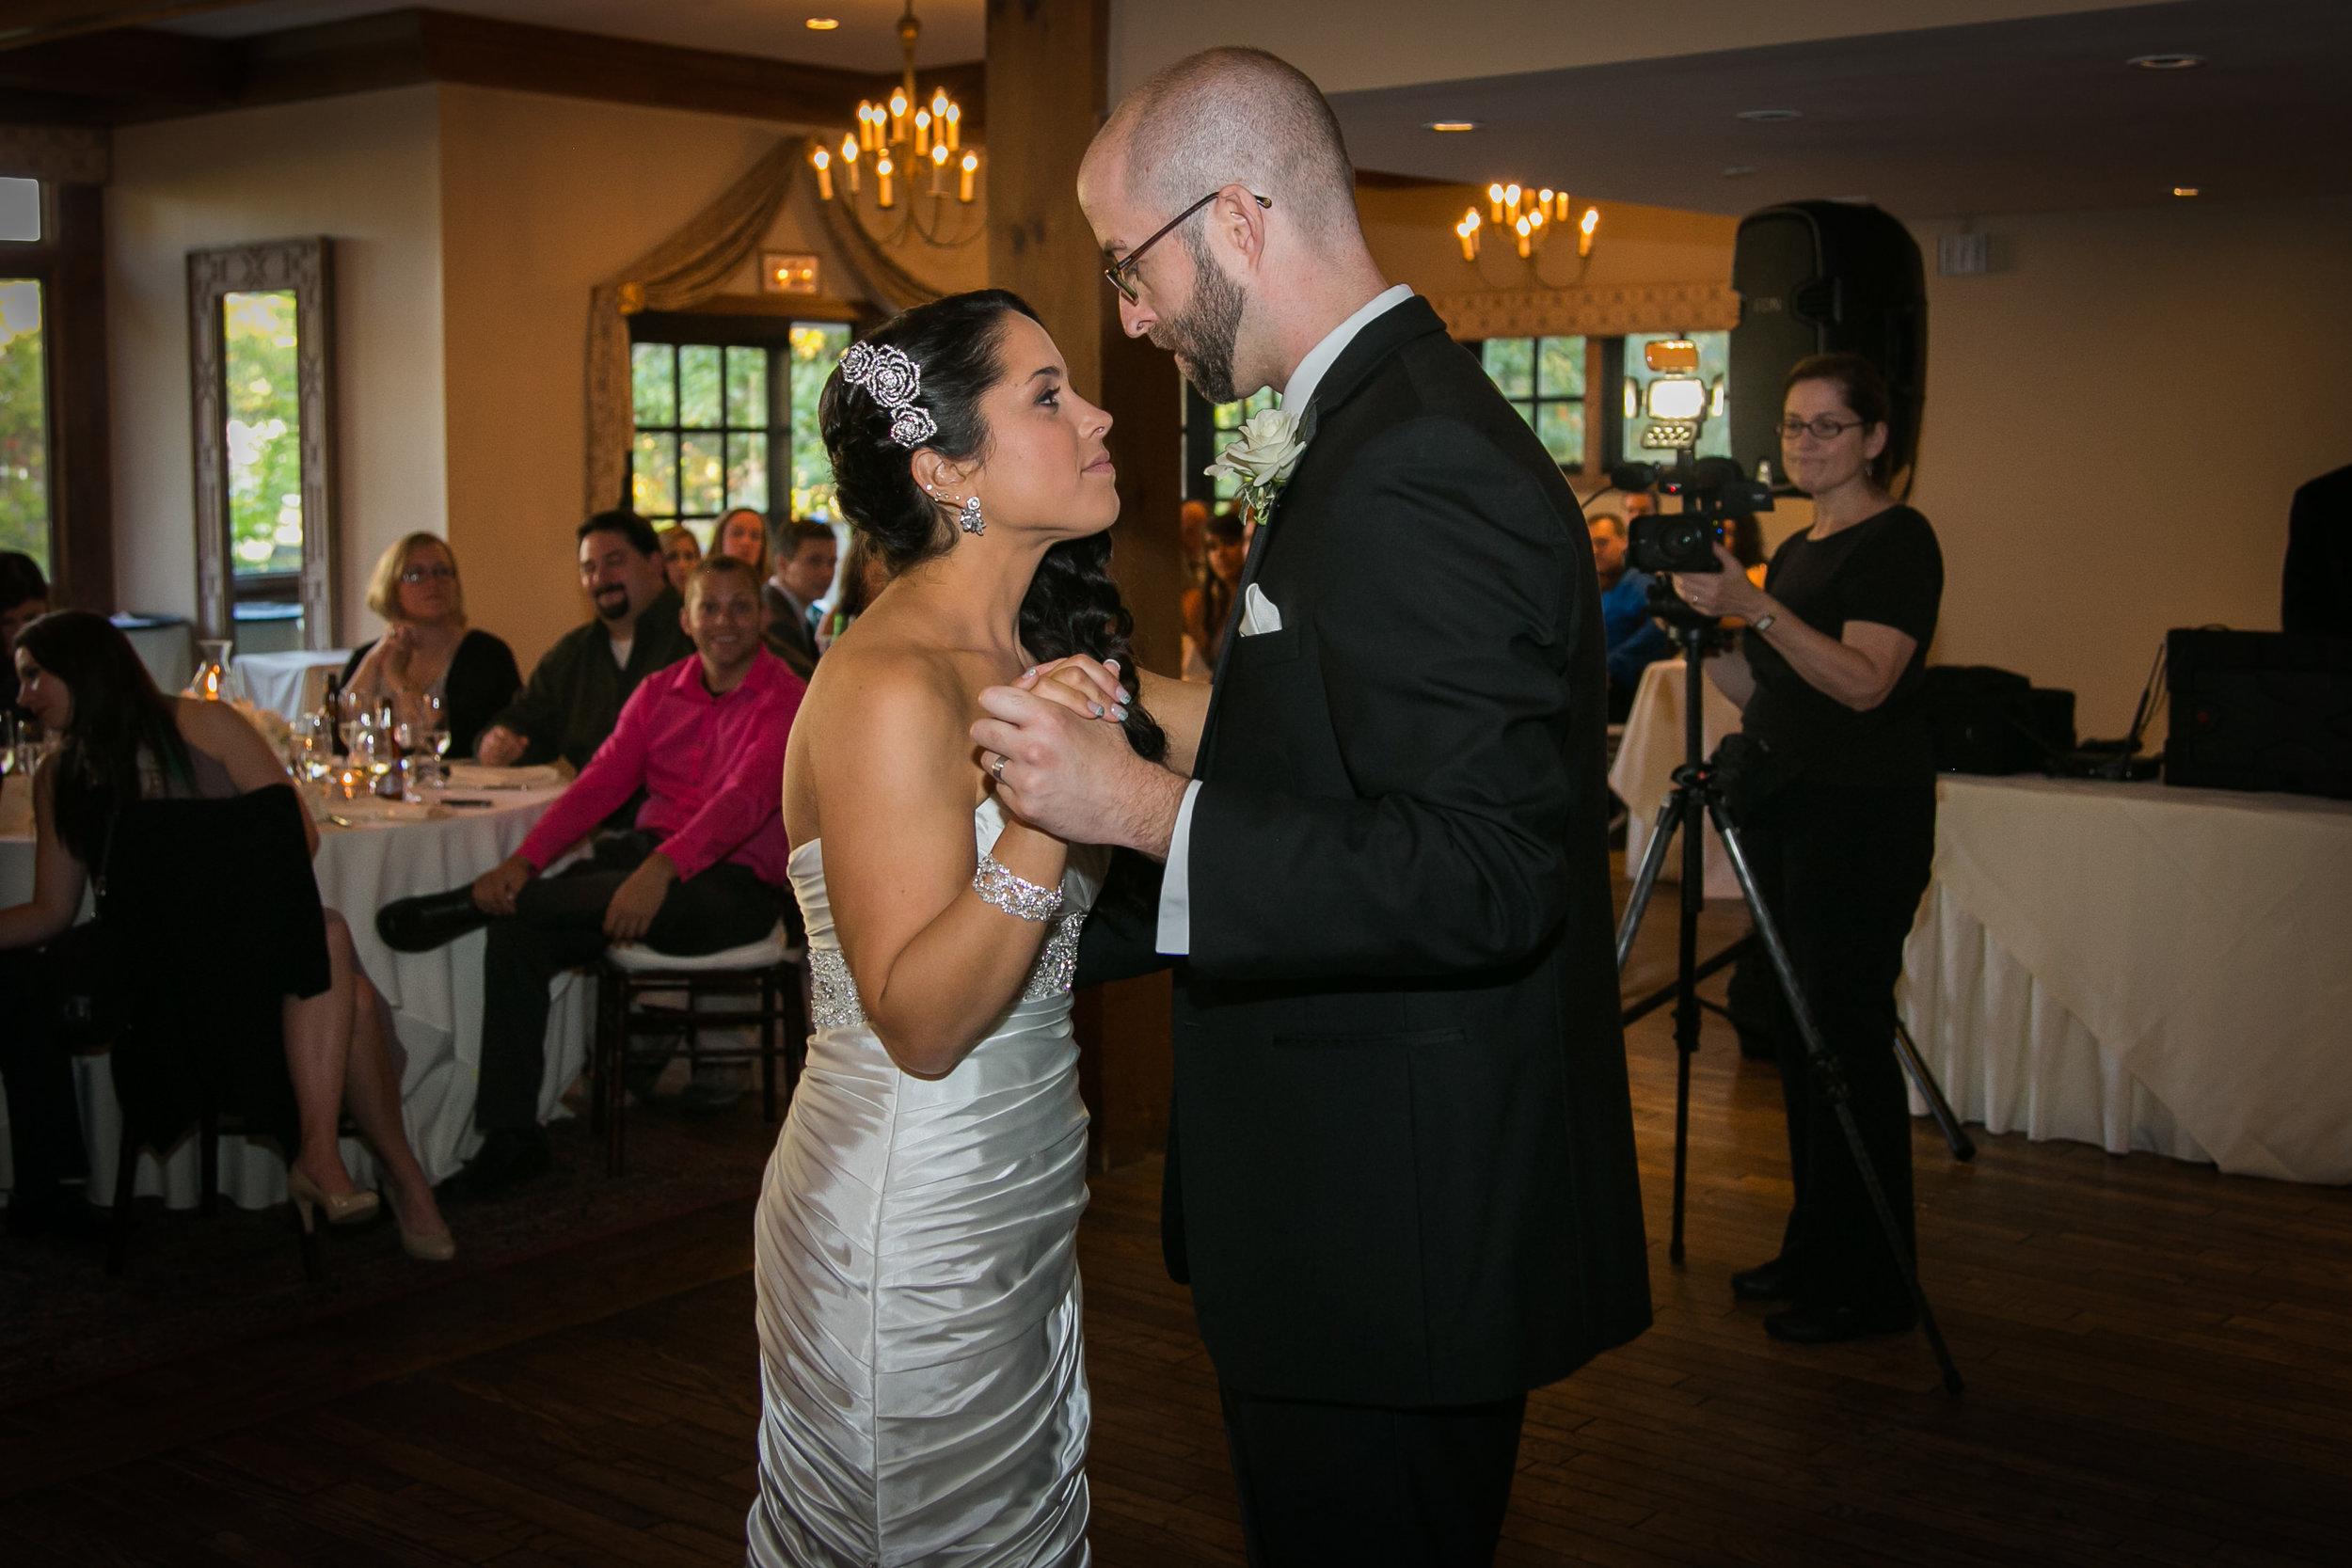 bedford-nh-wedding-photography-499.jpg